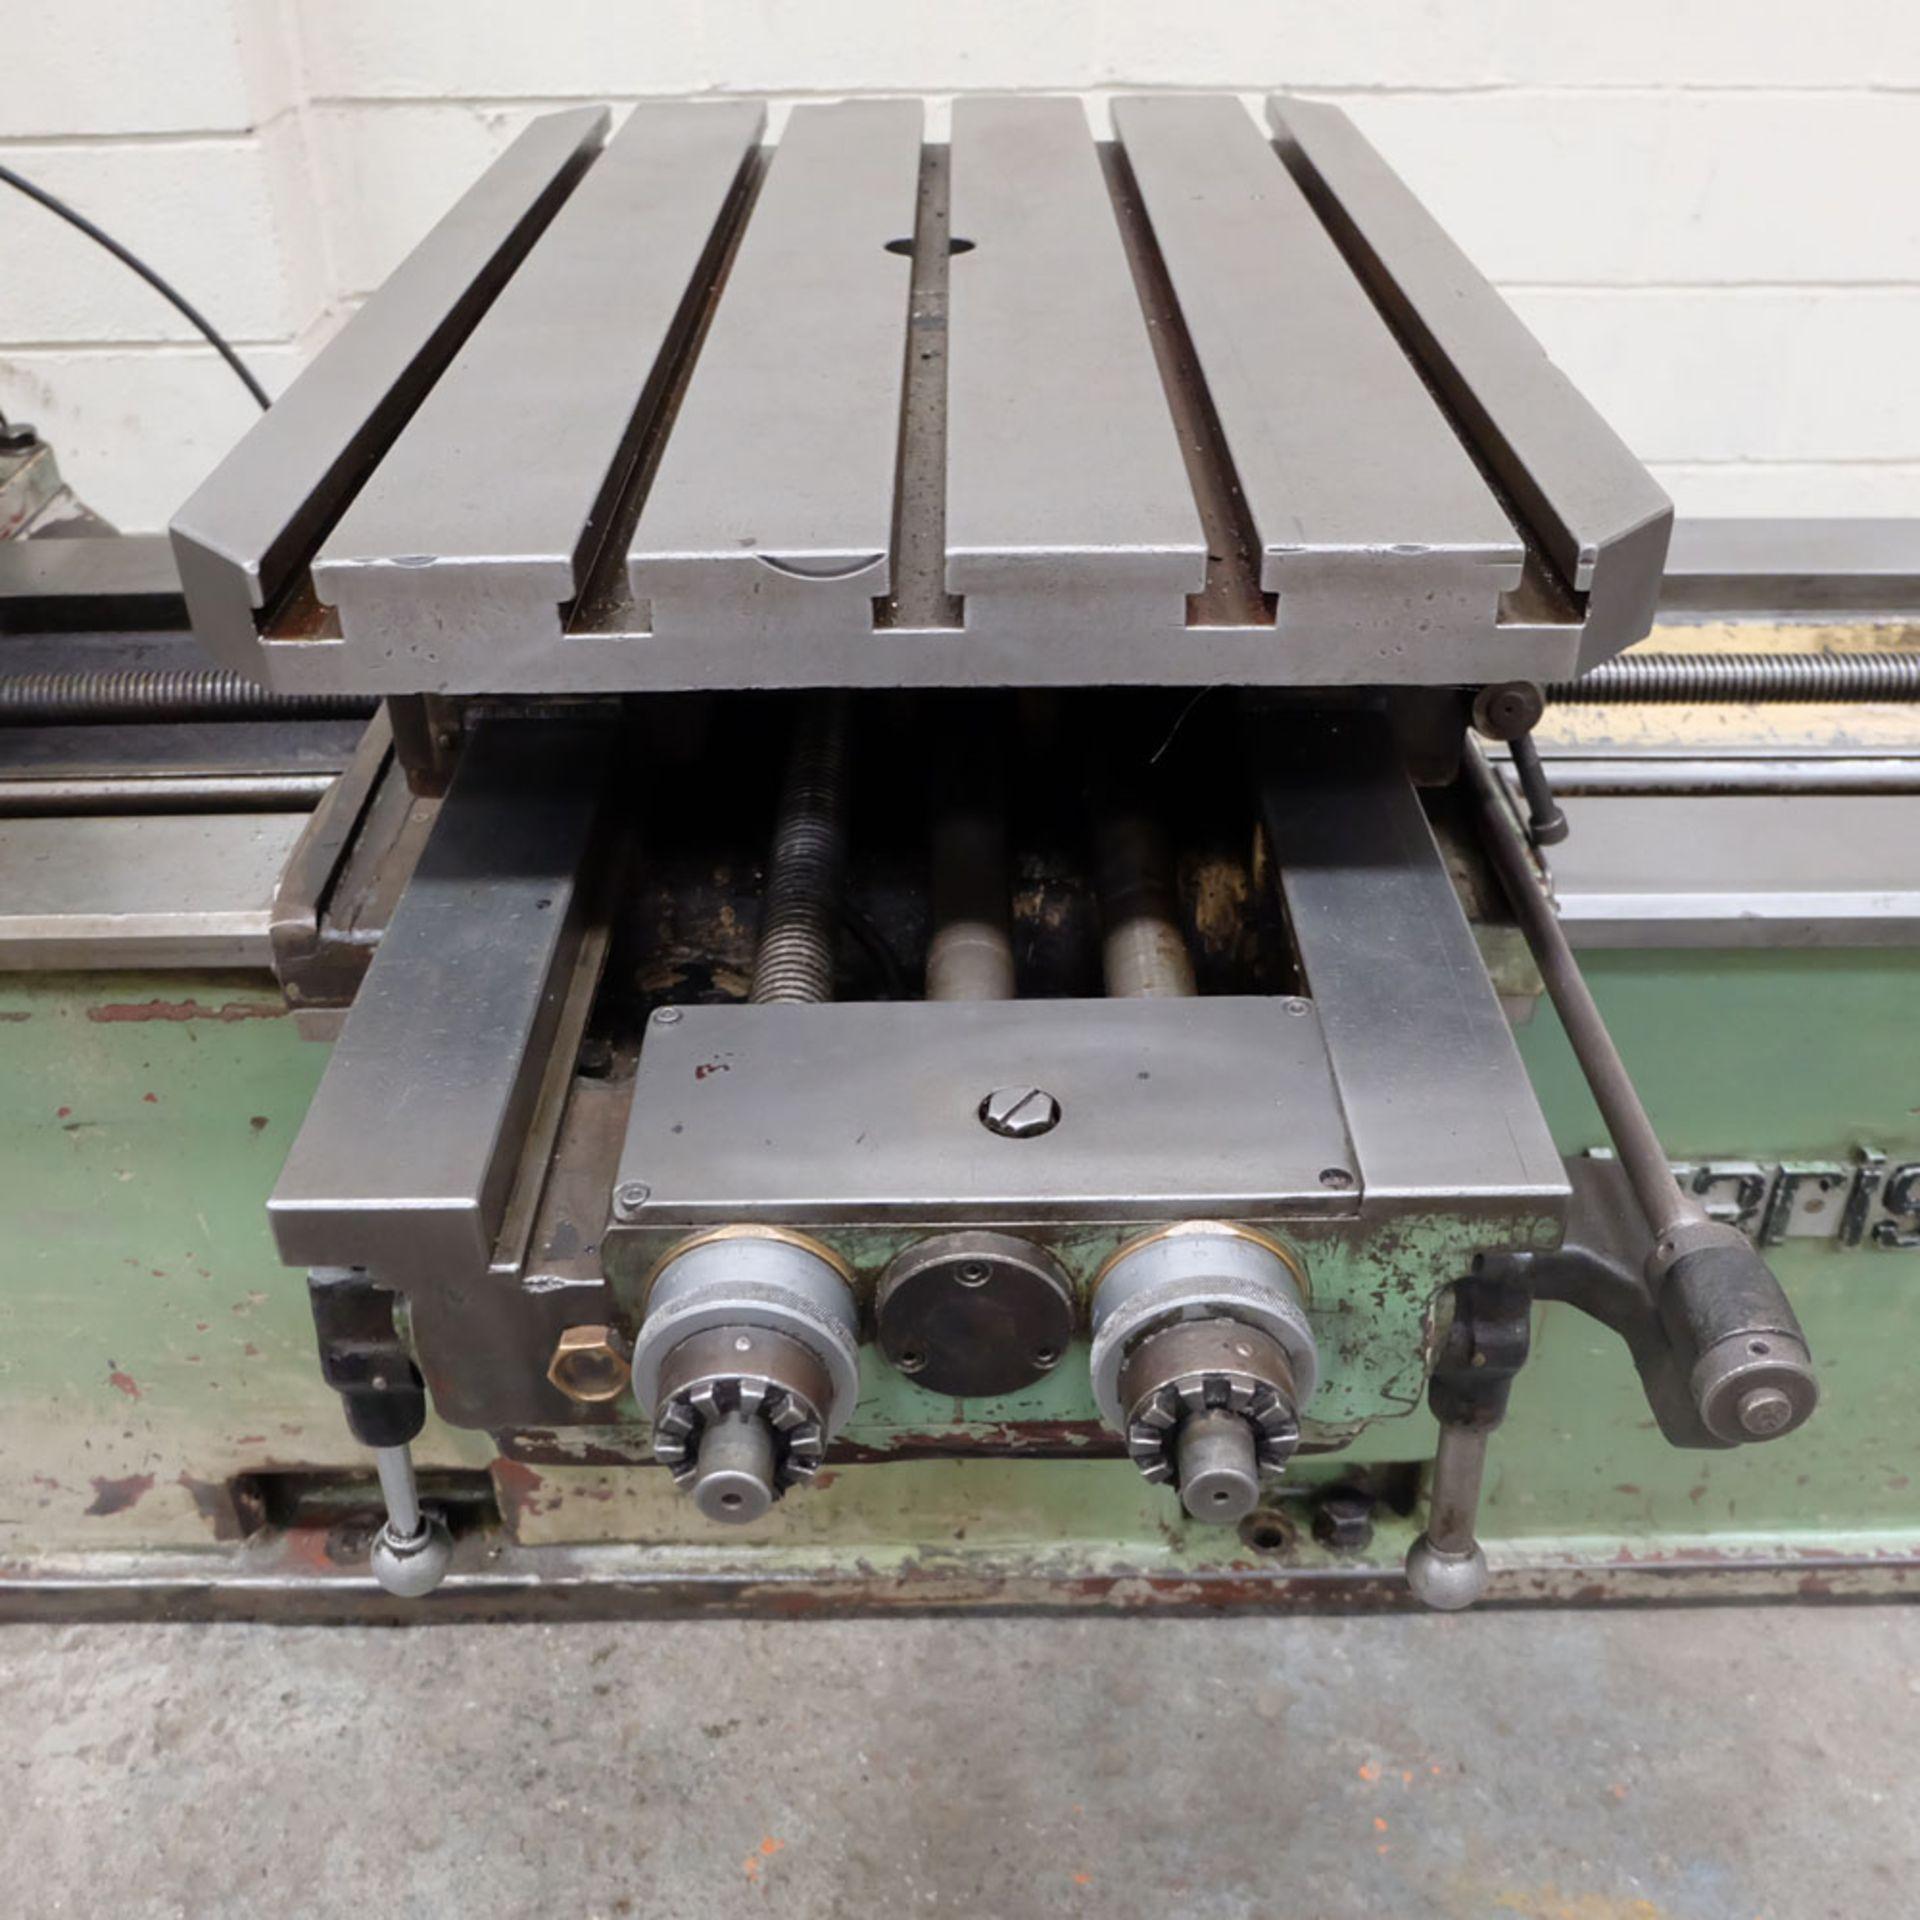 Juaristi Model MDR-55 Horizontal Boring Machine. Spindle Size: 55mm Dia. Spindle Bore: No.4 MT. - Image 10 of 14